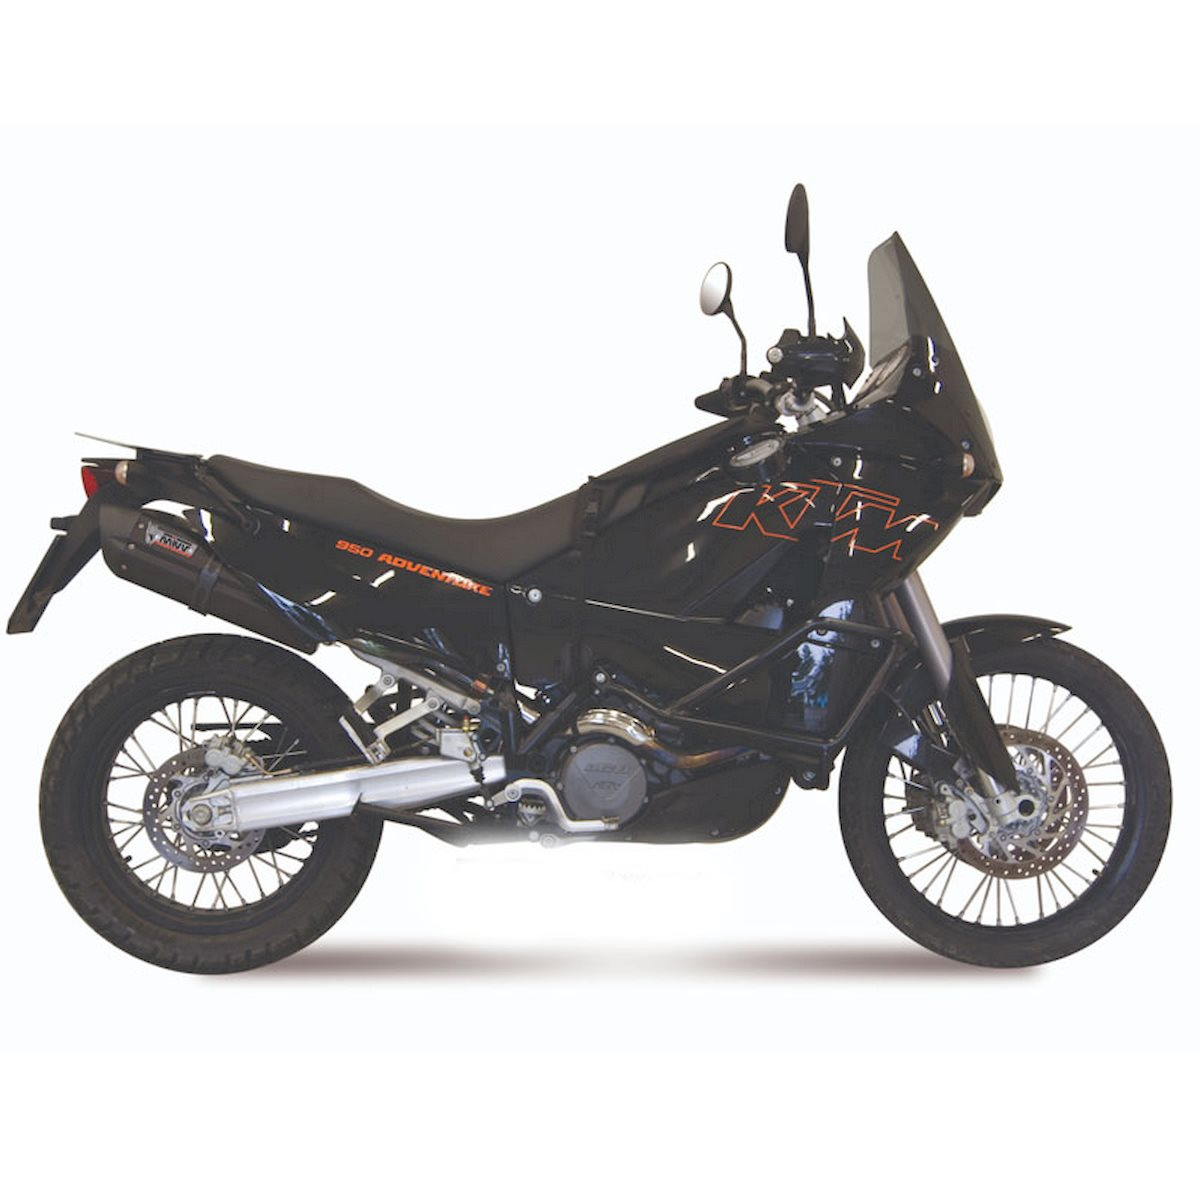 Image of KTM 950 ADVENTURE